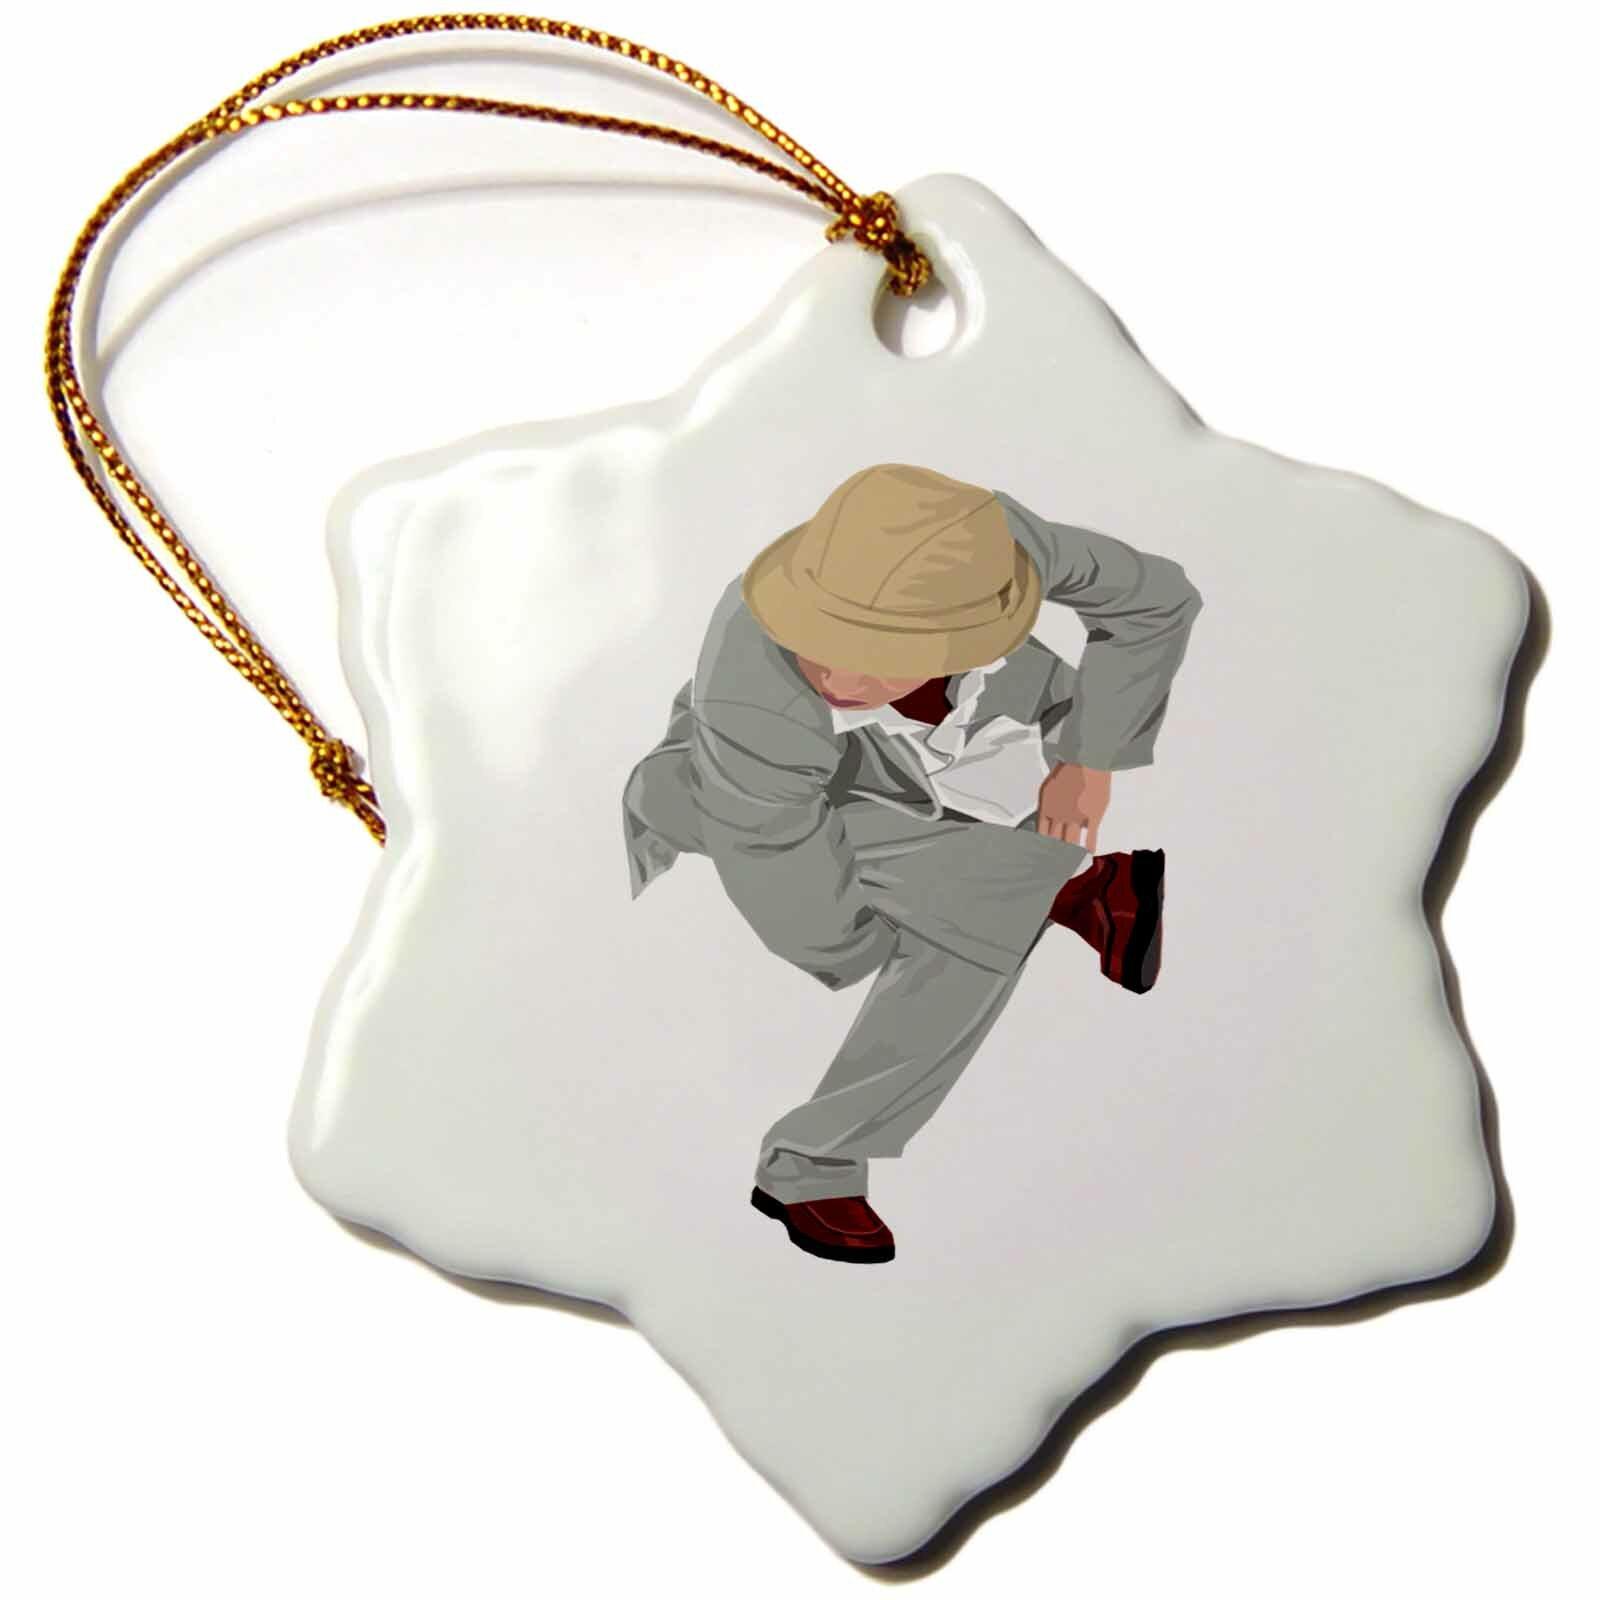 The Holiday Aisle Print Of Cartoon Break Dancer Snowflake Holiday Shaped Ornament Wayfair